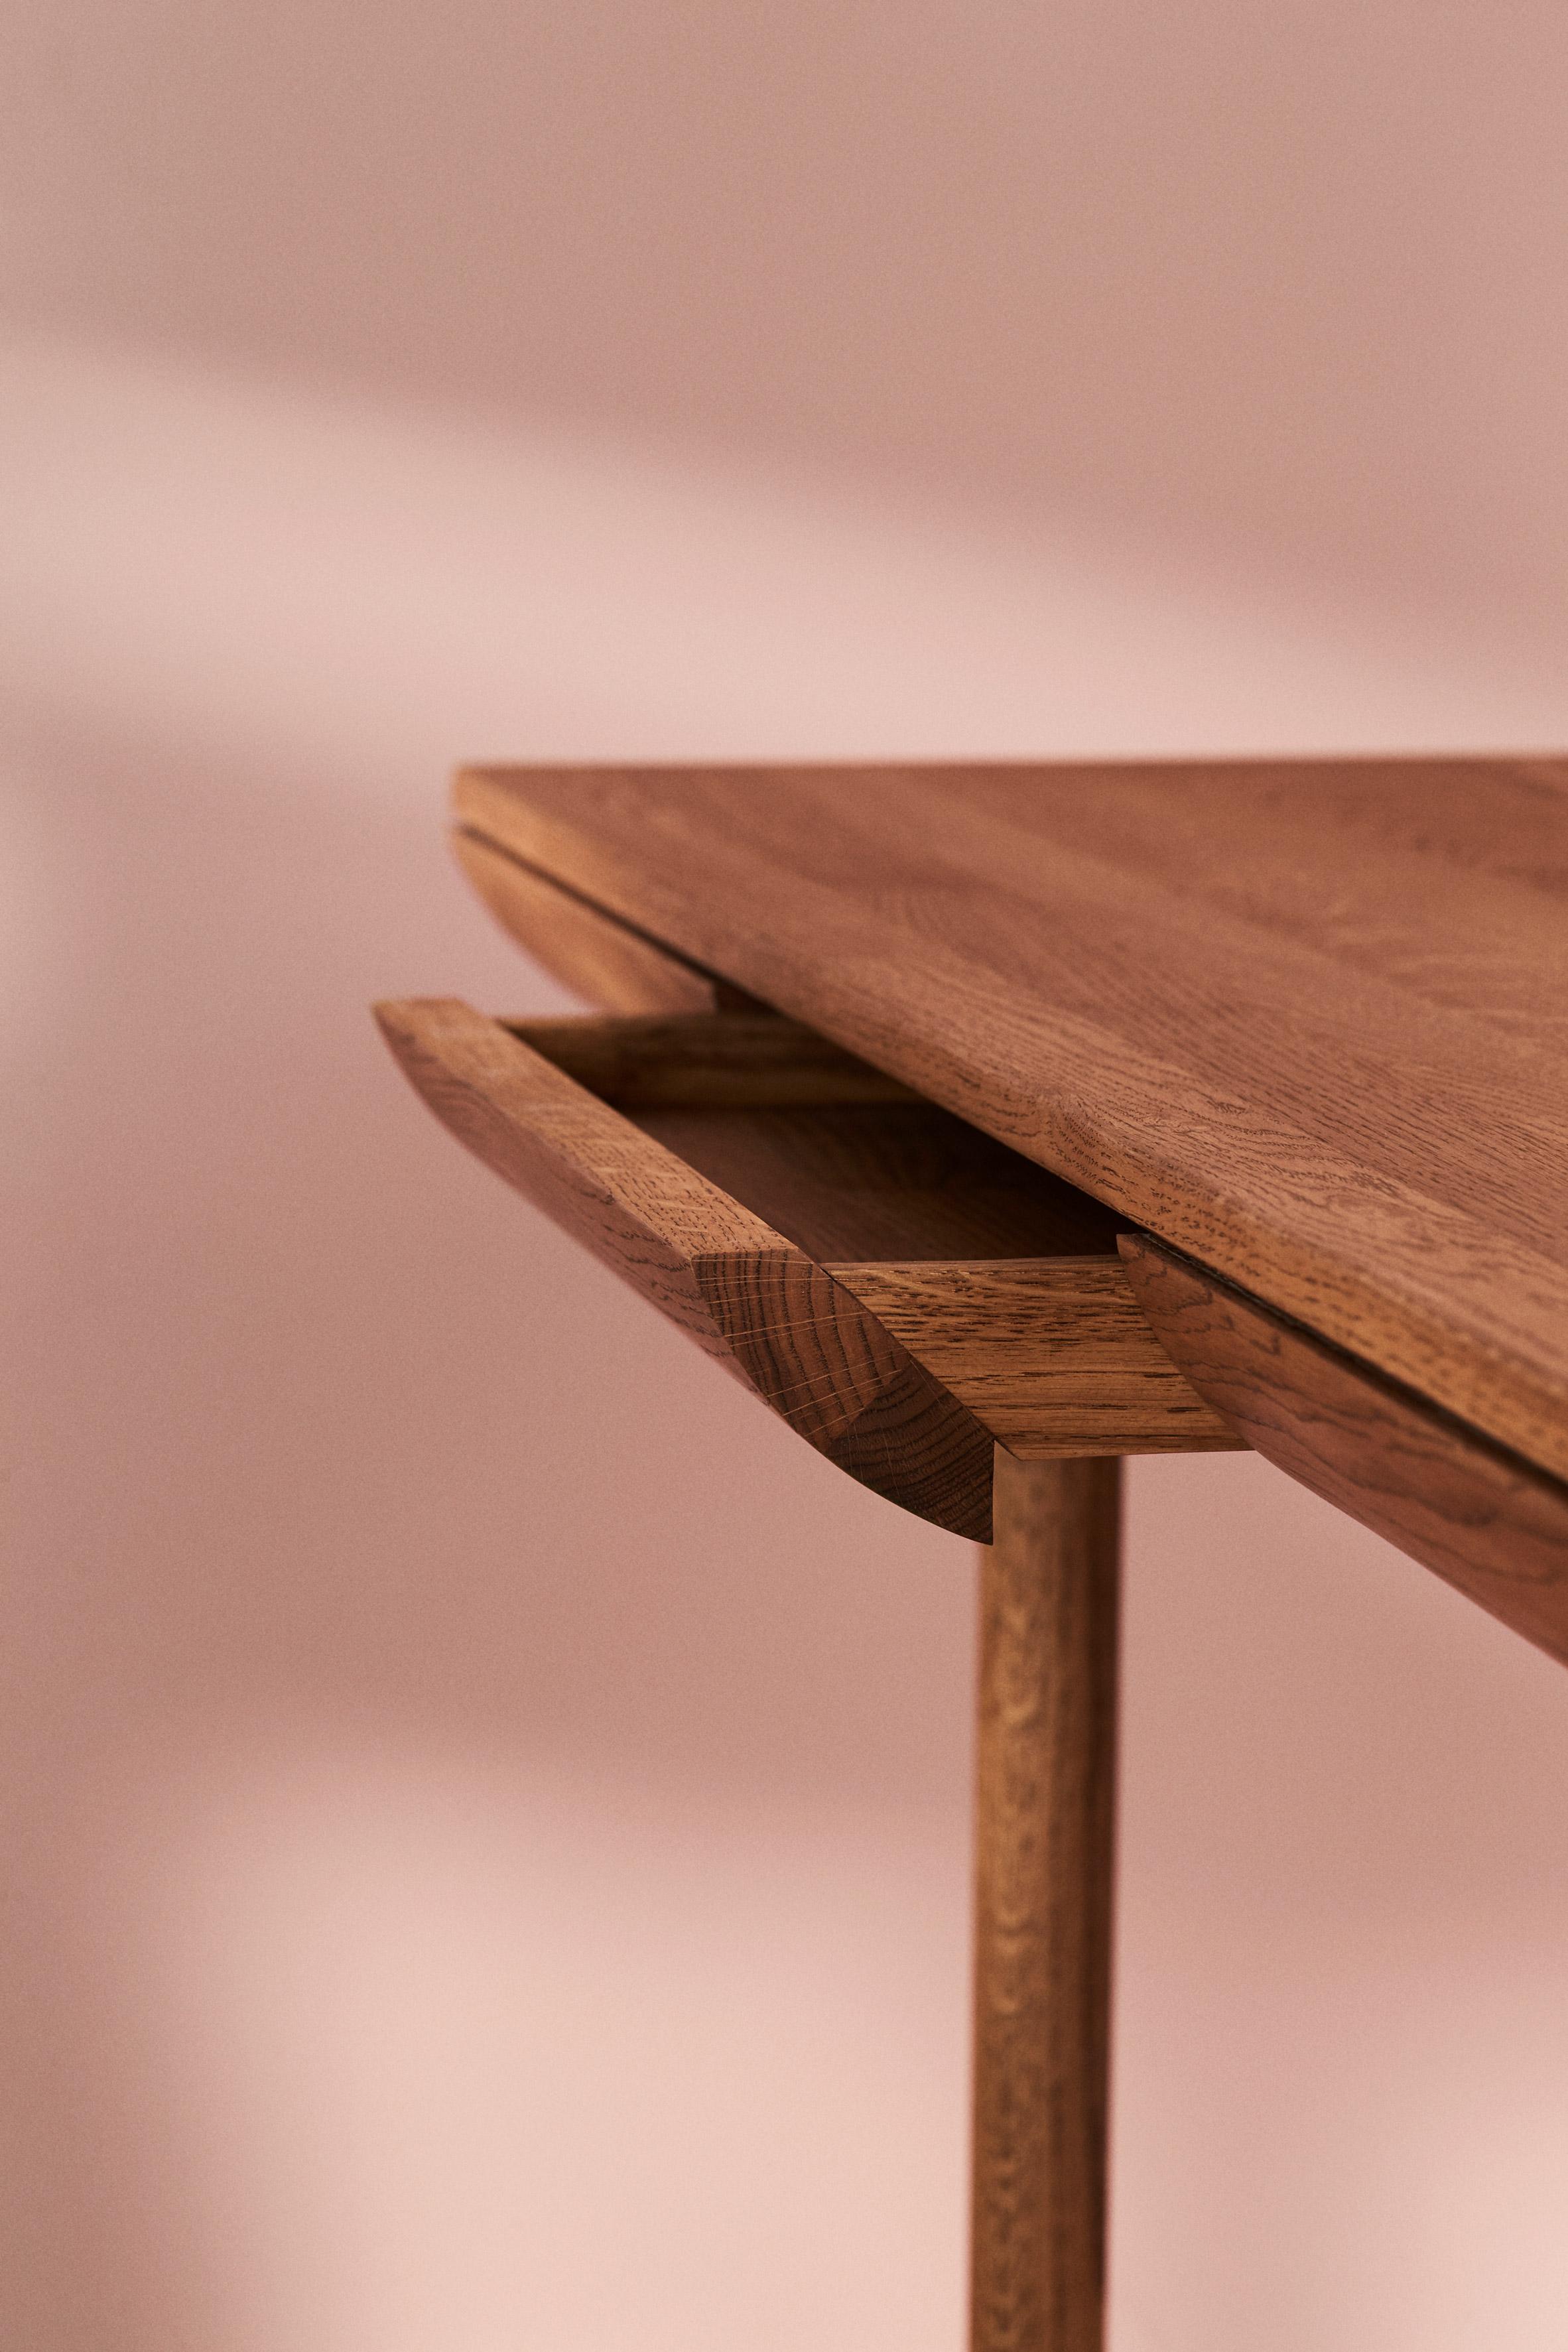 runa-isabel-ahm-aarm-nordic-design-furniture-danish_dezeen_2364_col_12.jpg